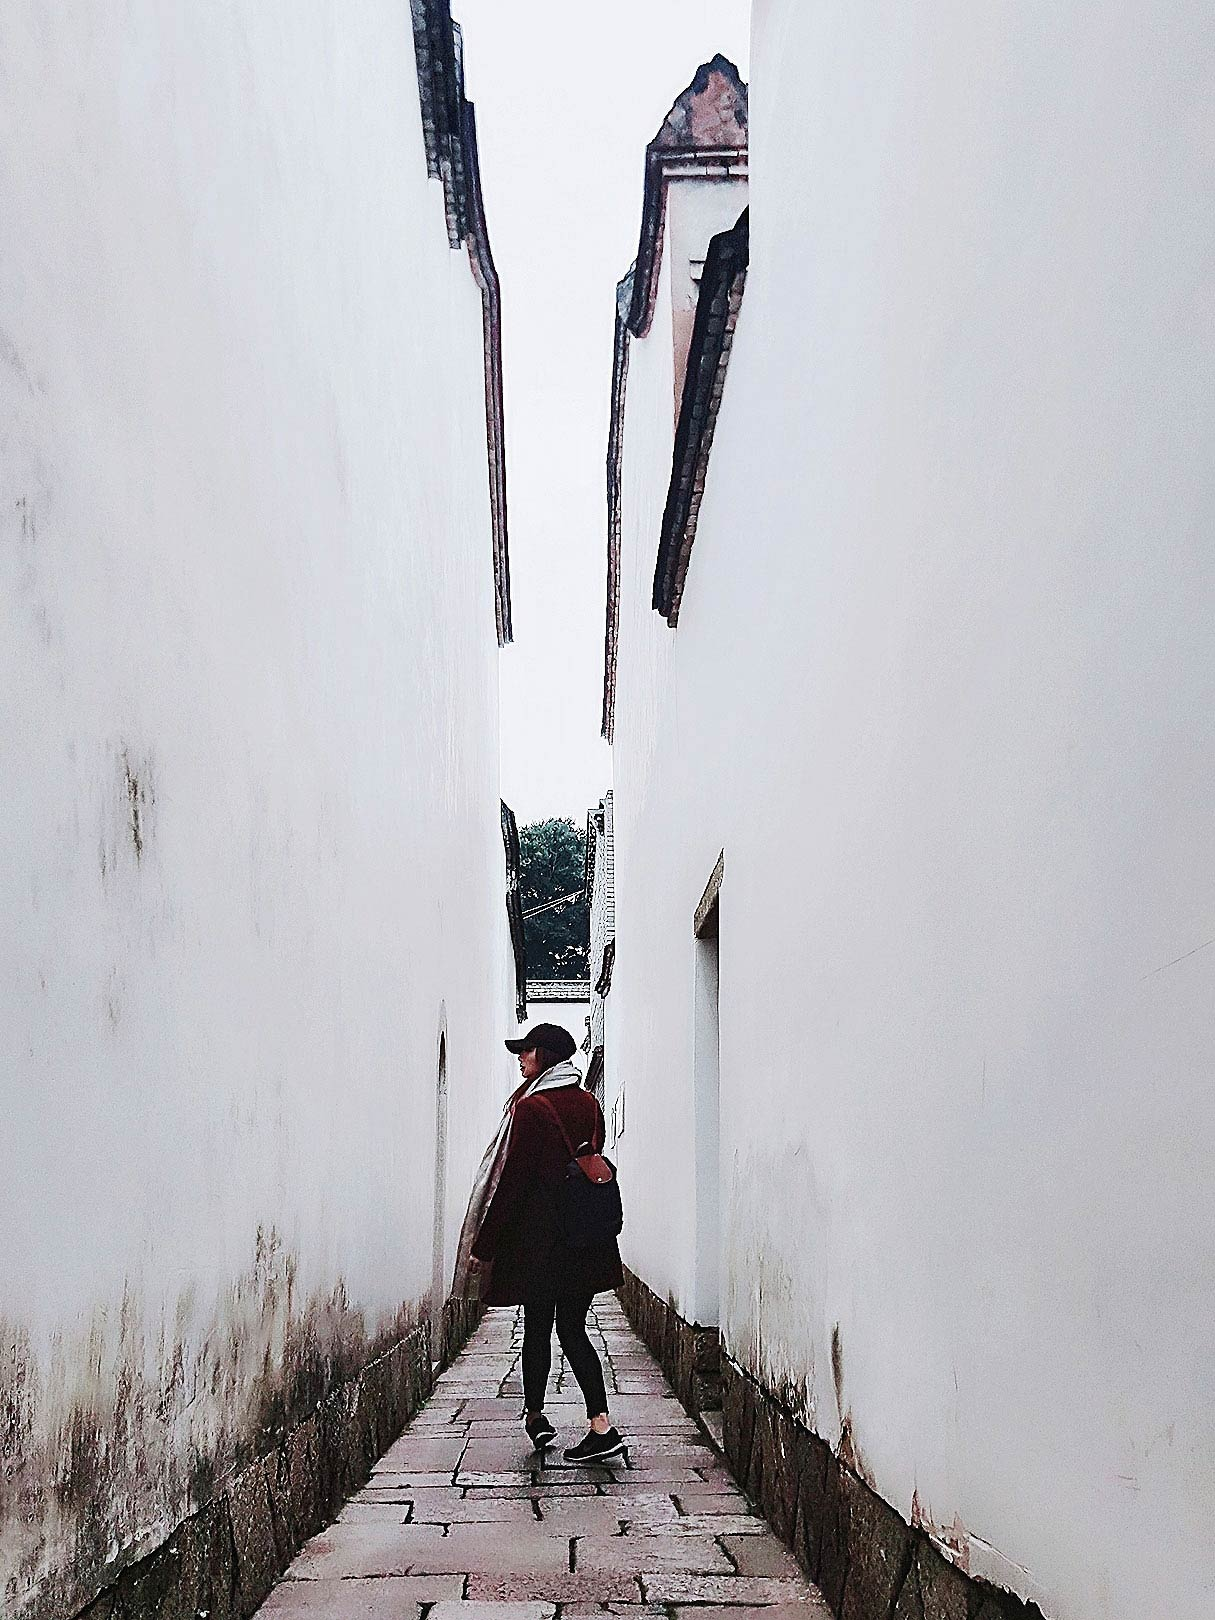 nicolyl Nicol Yuk Lui Wong 黄郁蕾 Fuzhou Sanfang Qixiang Three Lanes and Seven Alleys